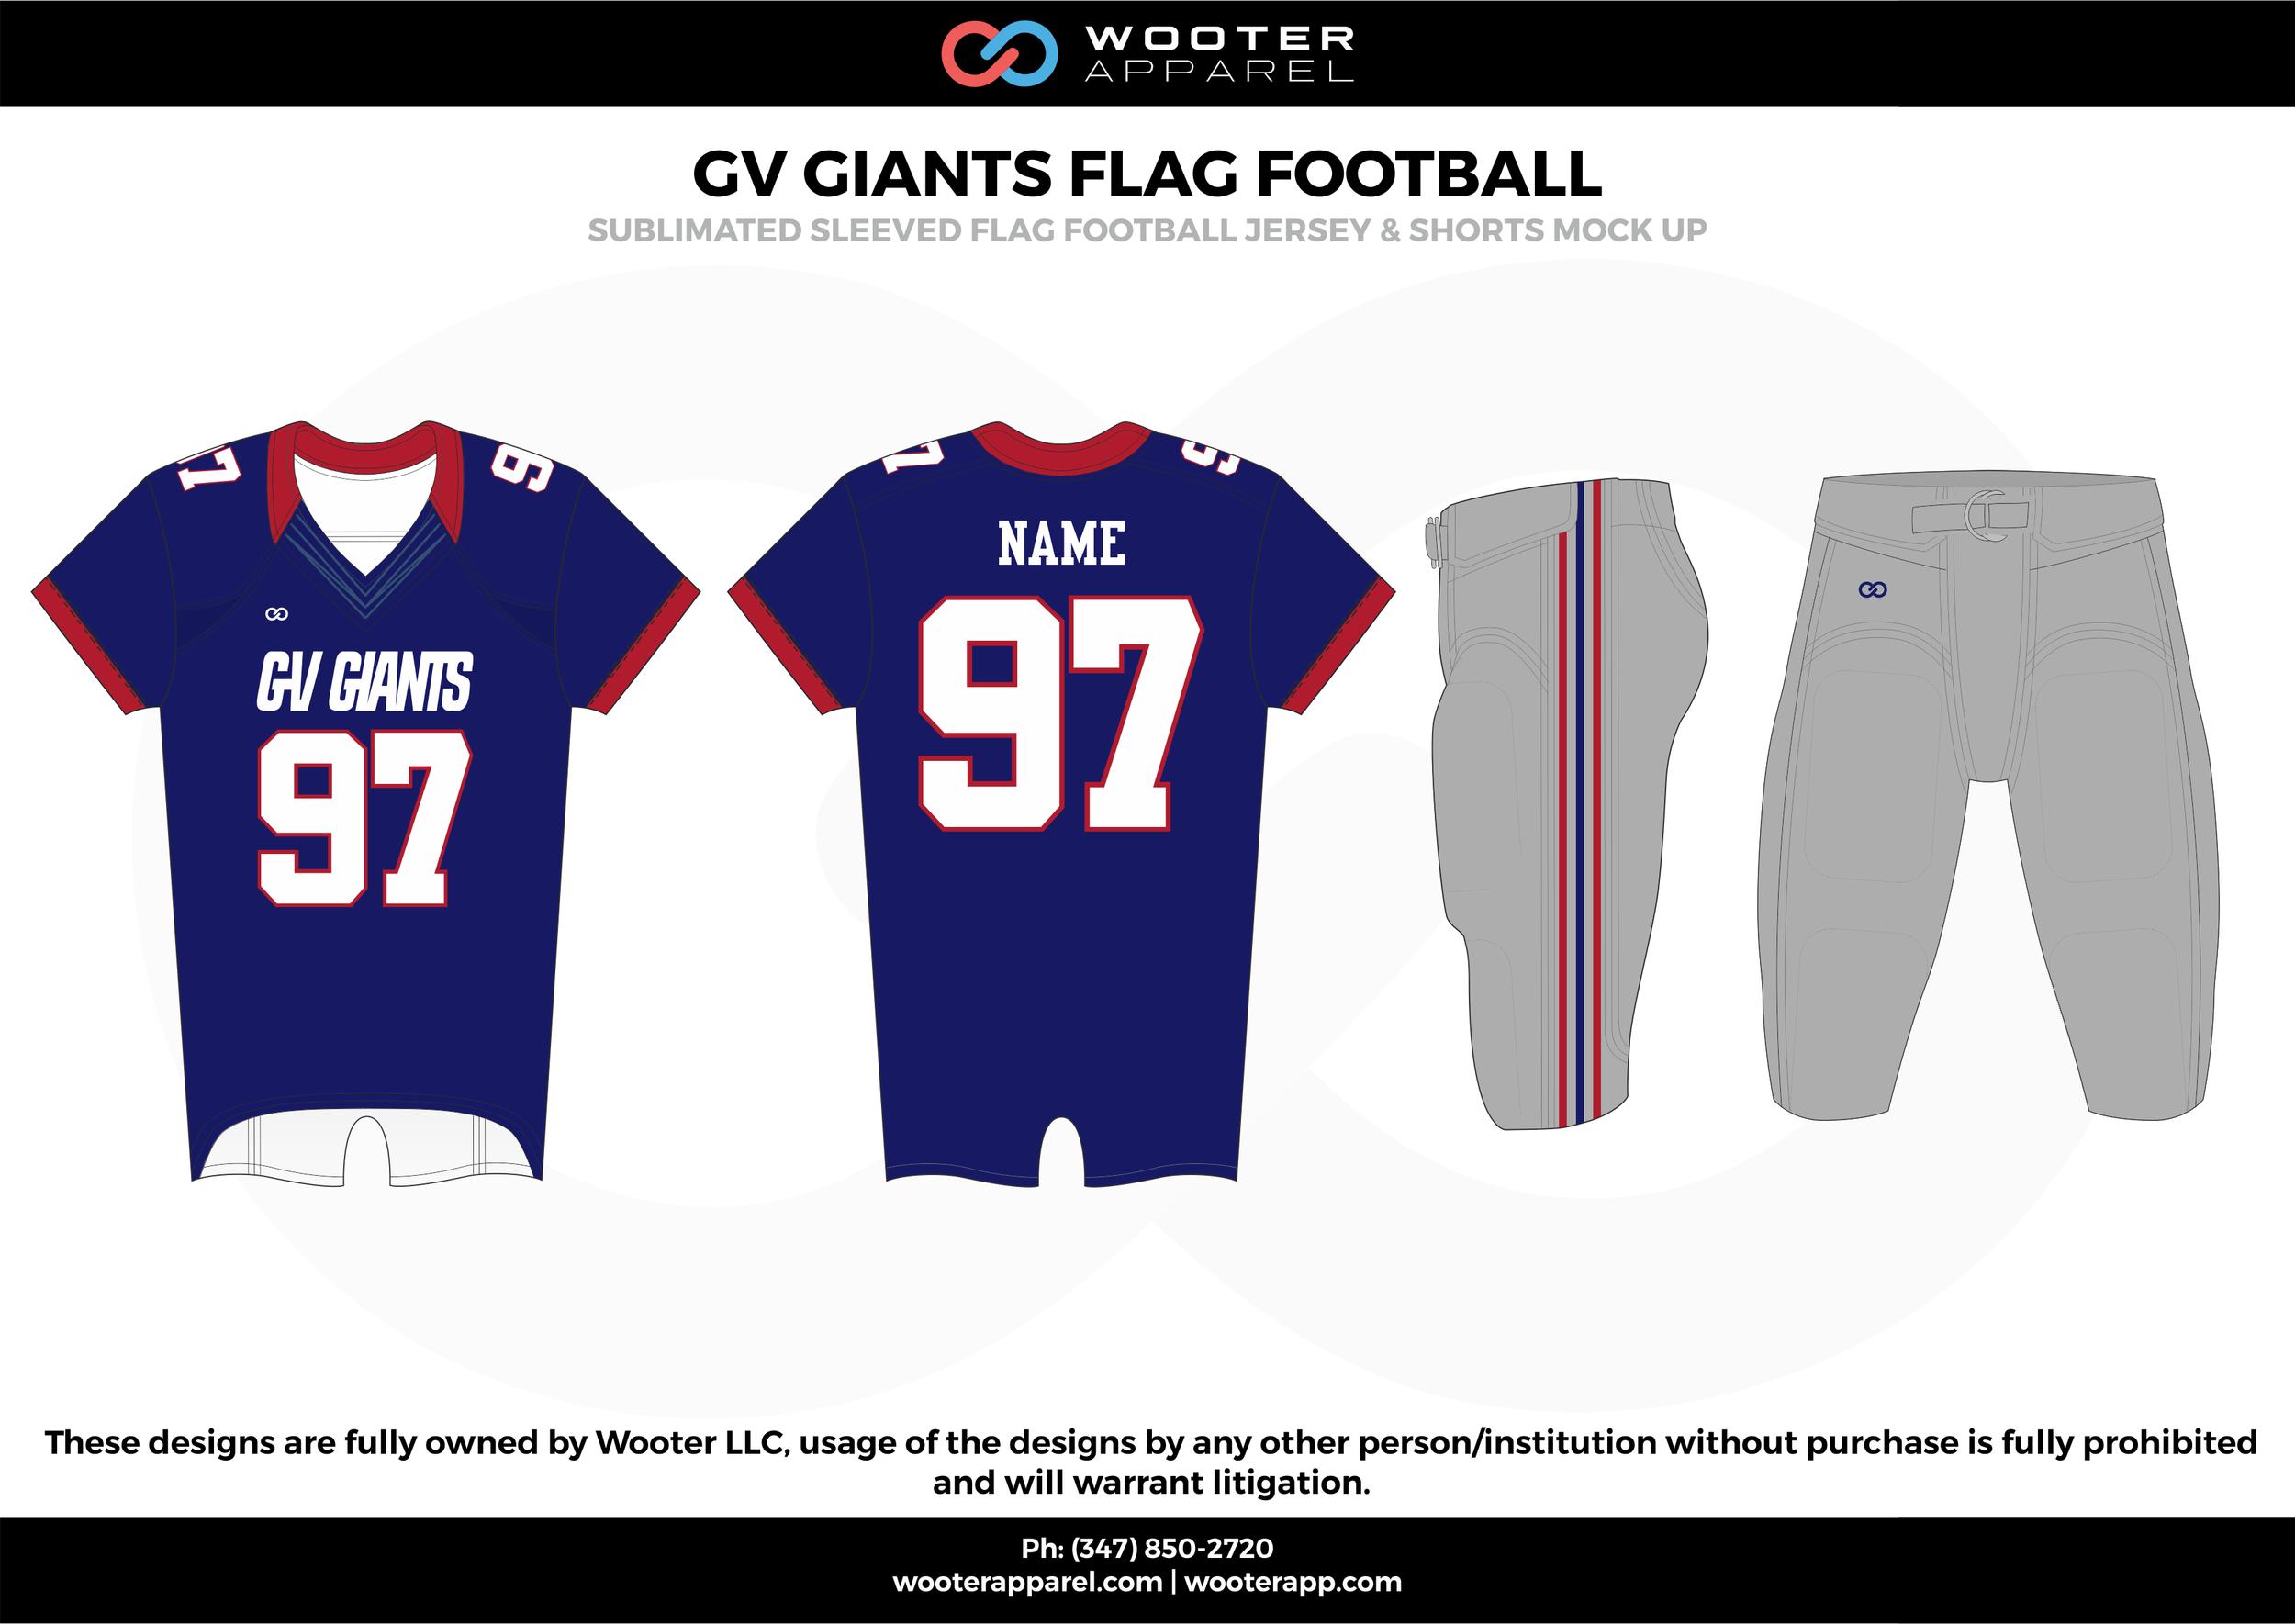 GV GIANTS FLAG FOOTBALL blue gray red white flag football uniforms jerseys pants